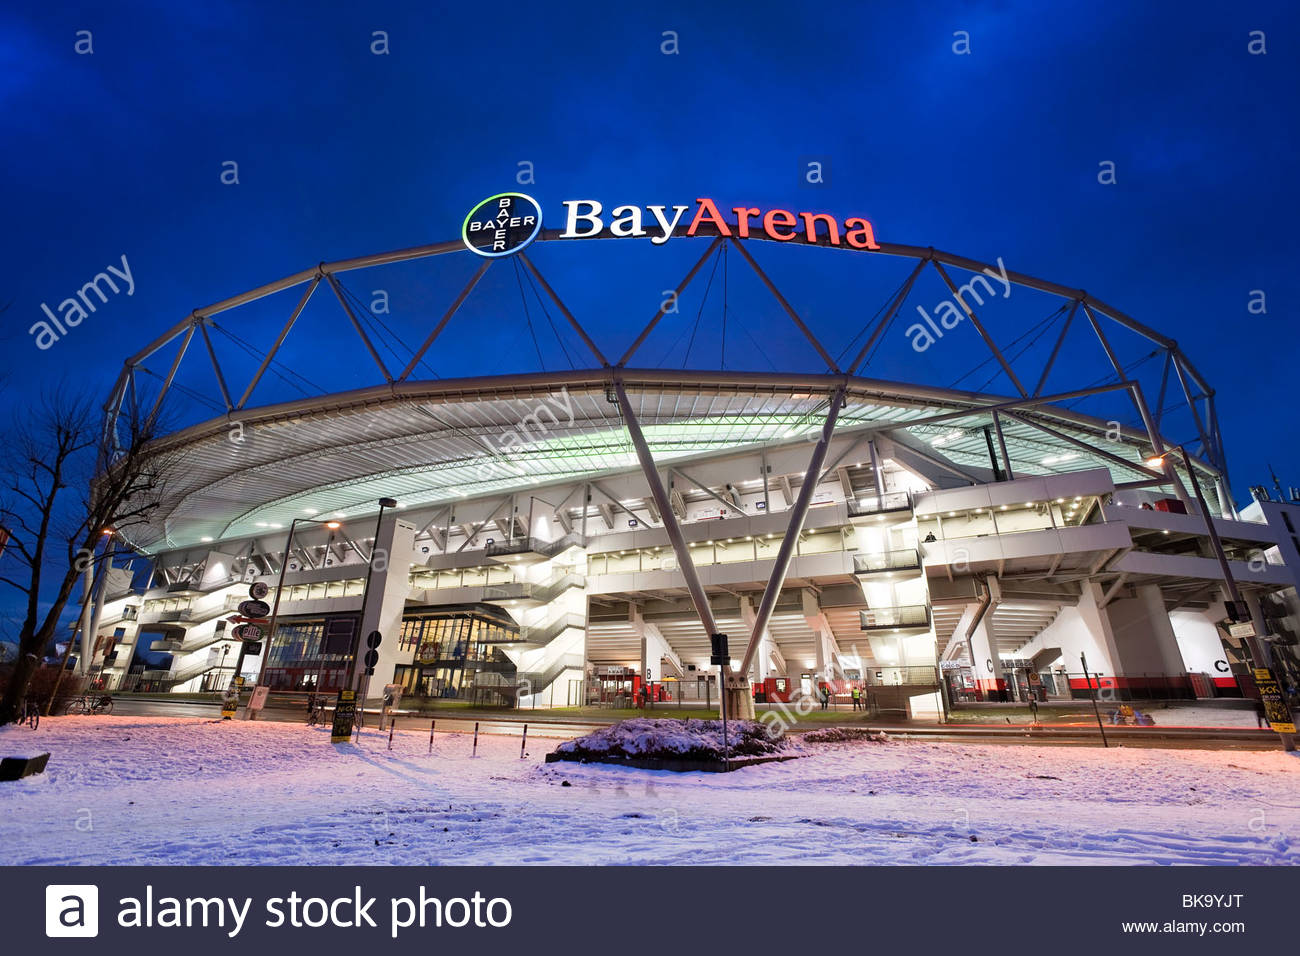 BayArena football stadium, Leverkusen, Germany - Stock Image